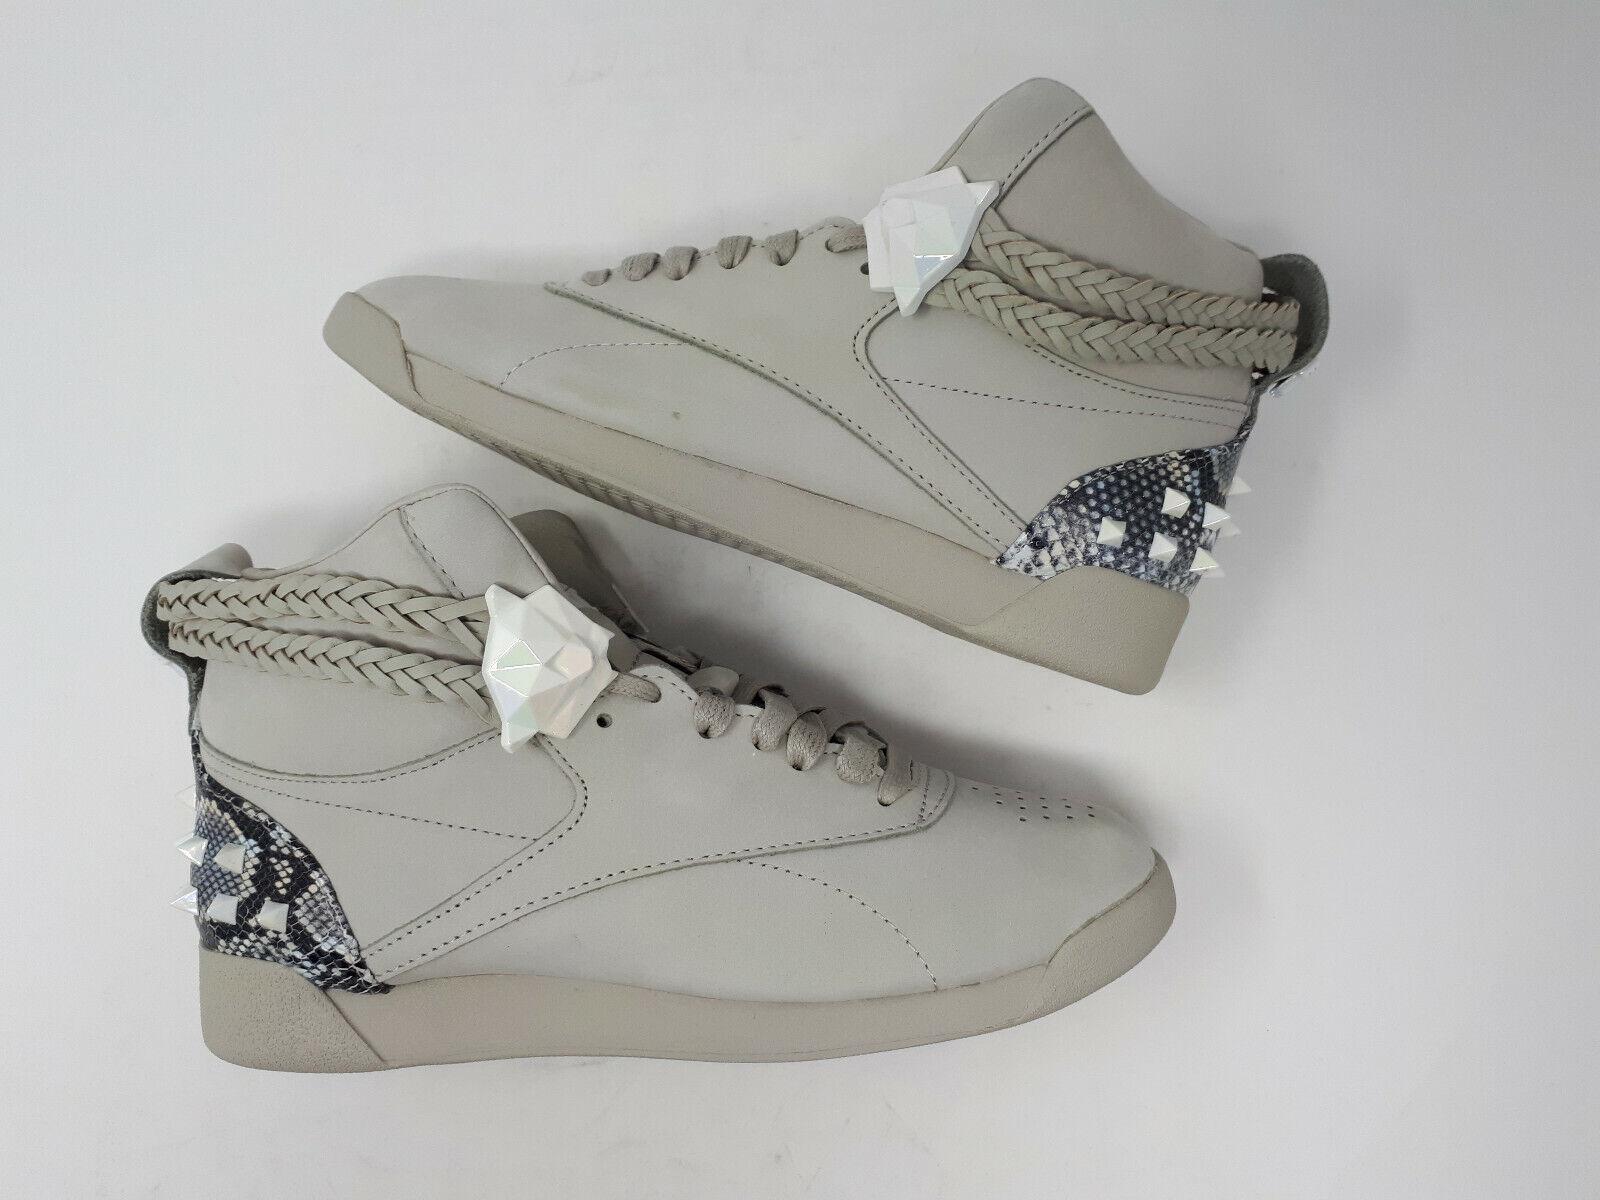 Nouveau Reebok Wonder Woman Freestyle Hi Chaussures Sneaker FW4658 Gris Pour Femme Chaussures Taille 7